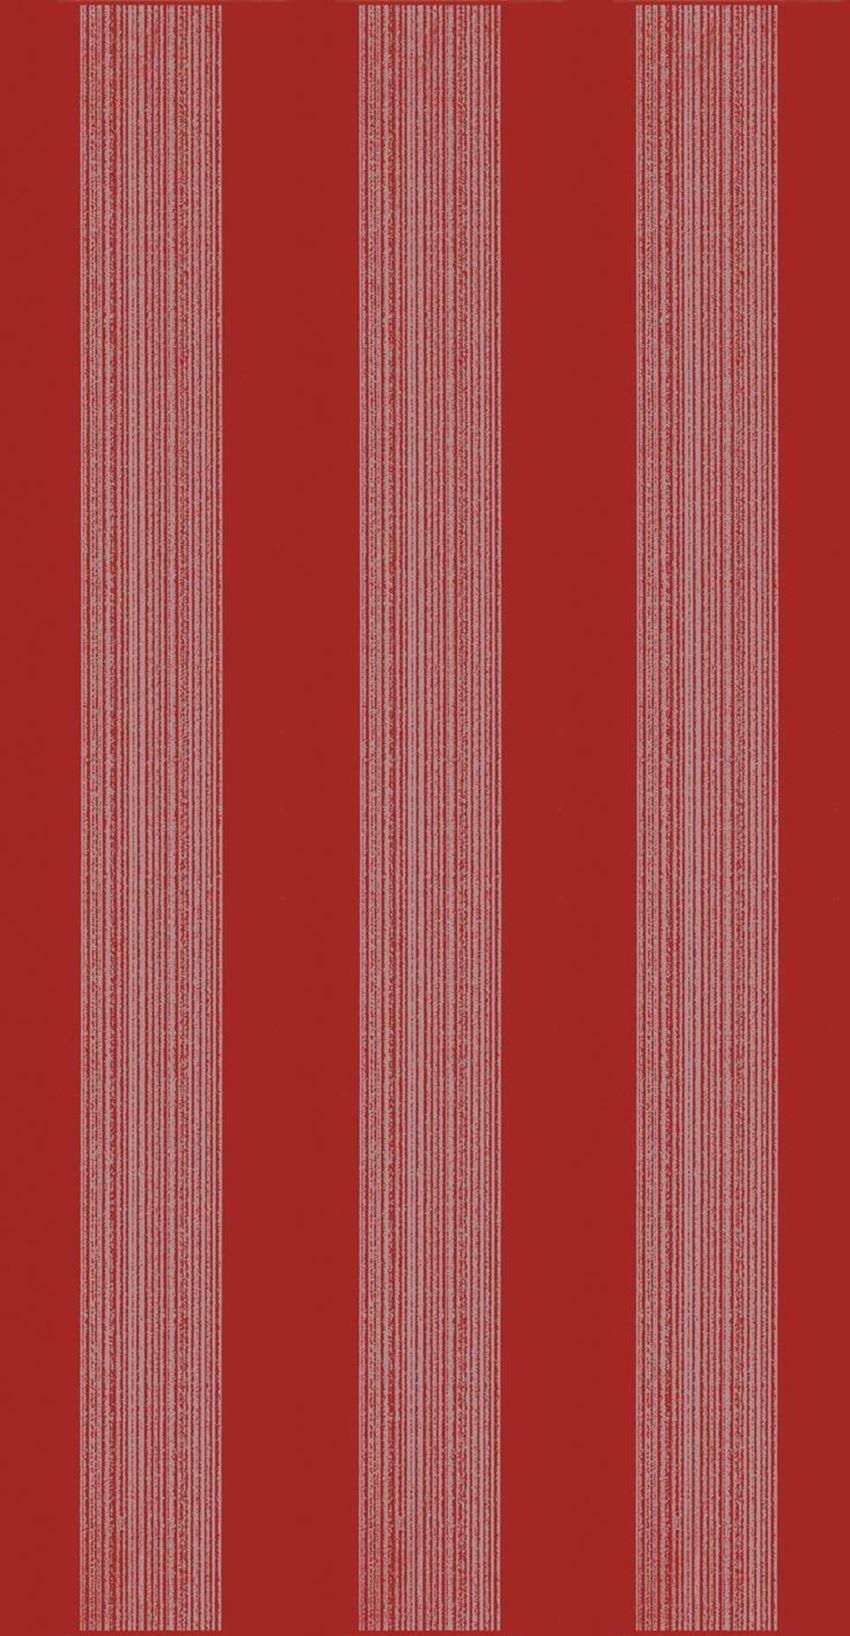 Dekoracja ścienna Paradyż Bellicita Rosa Inserto Stripes